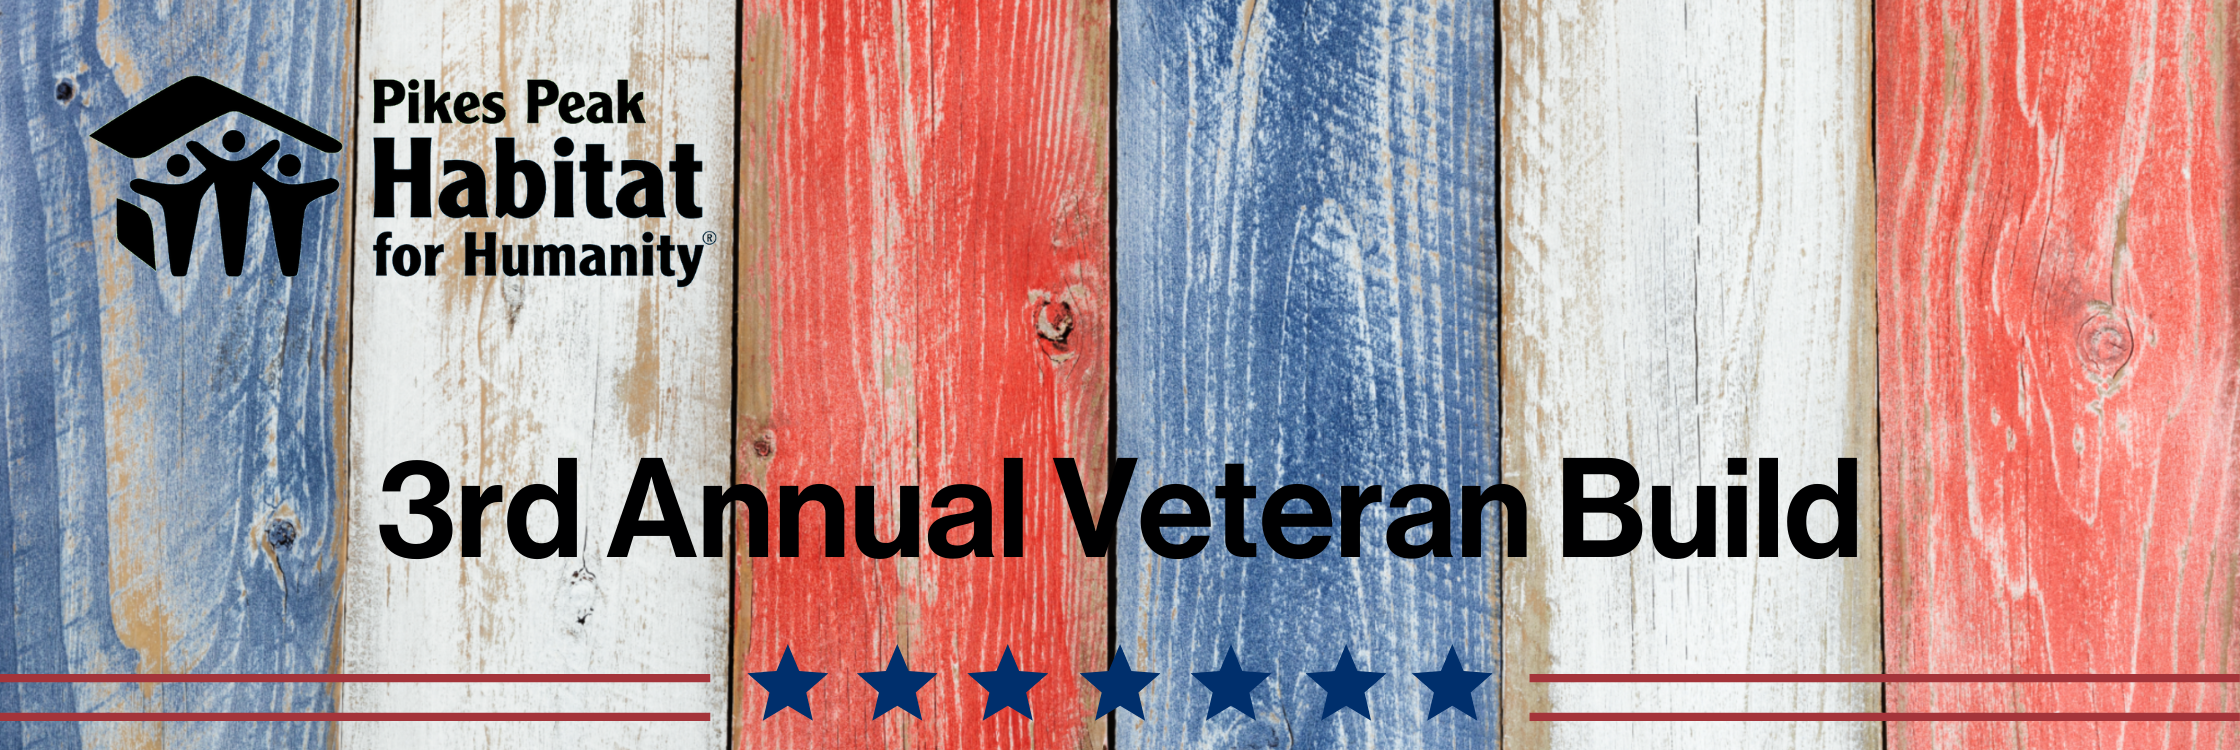 3rd Annual Veteran Build Web Banner